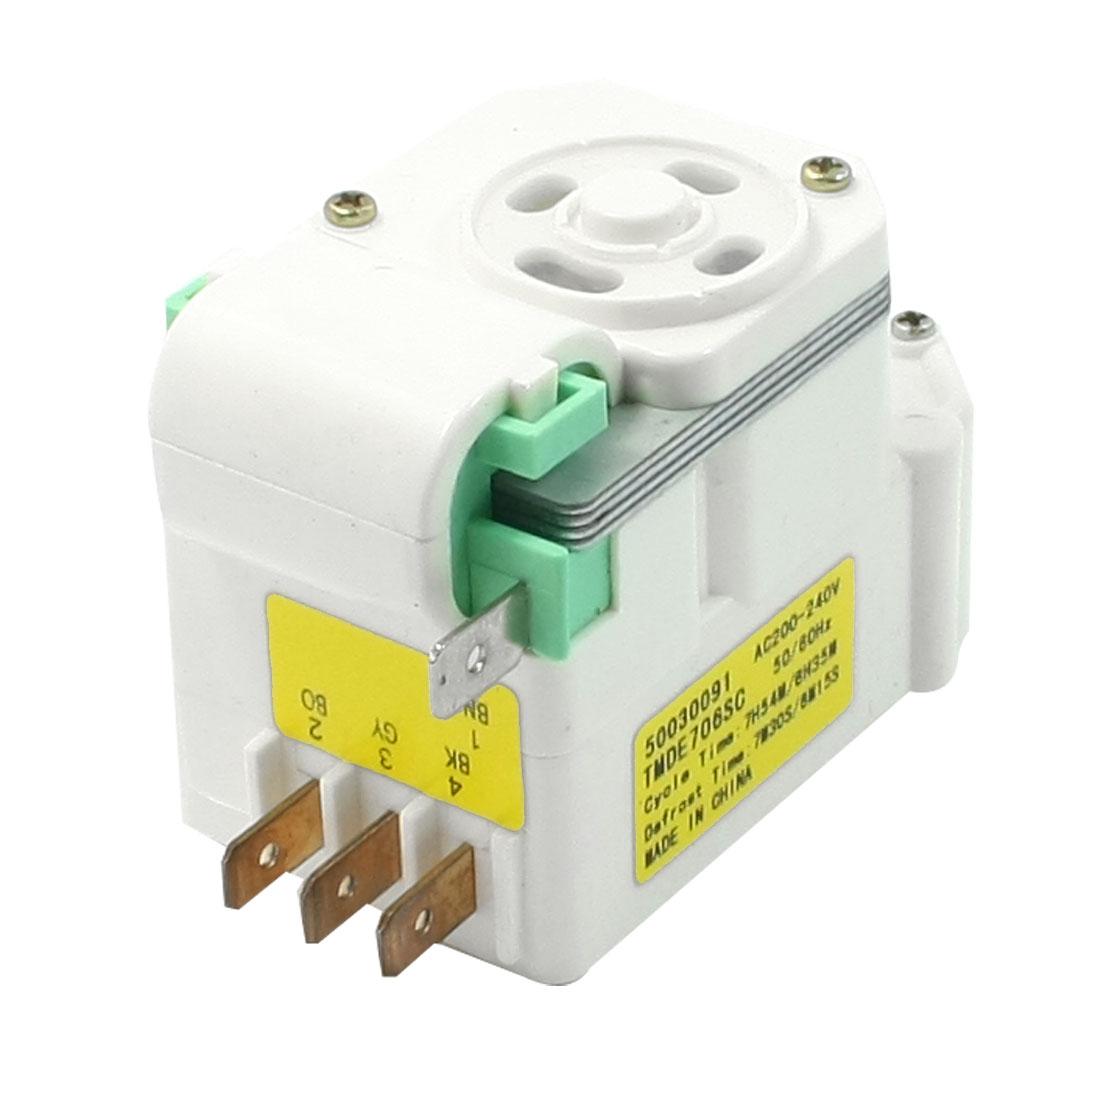 TMDE706SC Type 4 Pin Connector Refrigerator Defrost Timer AC200V/240V 50/60Hz